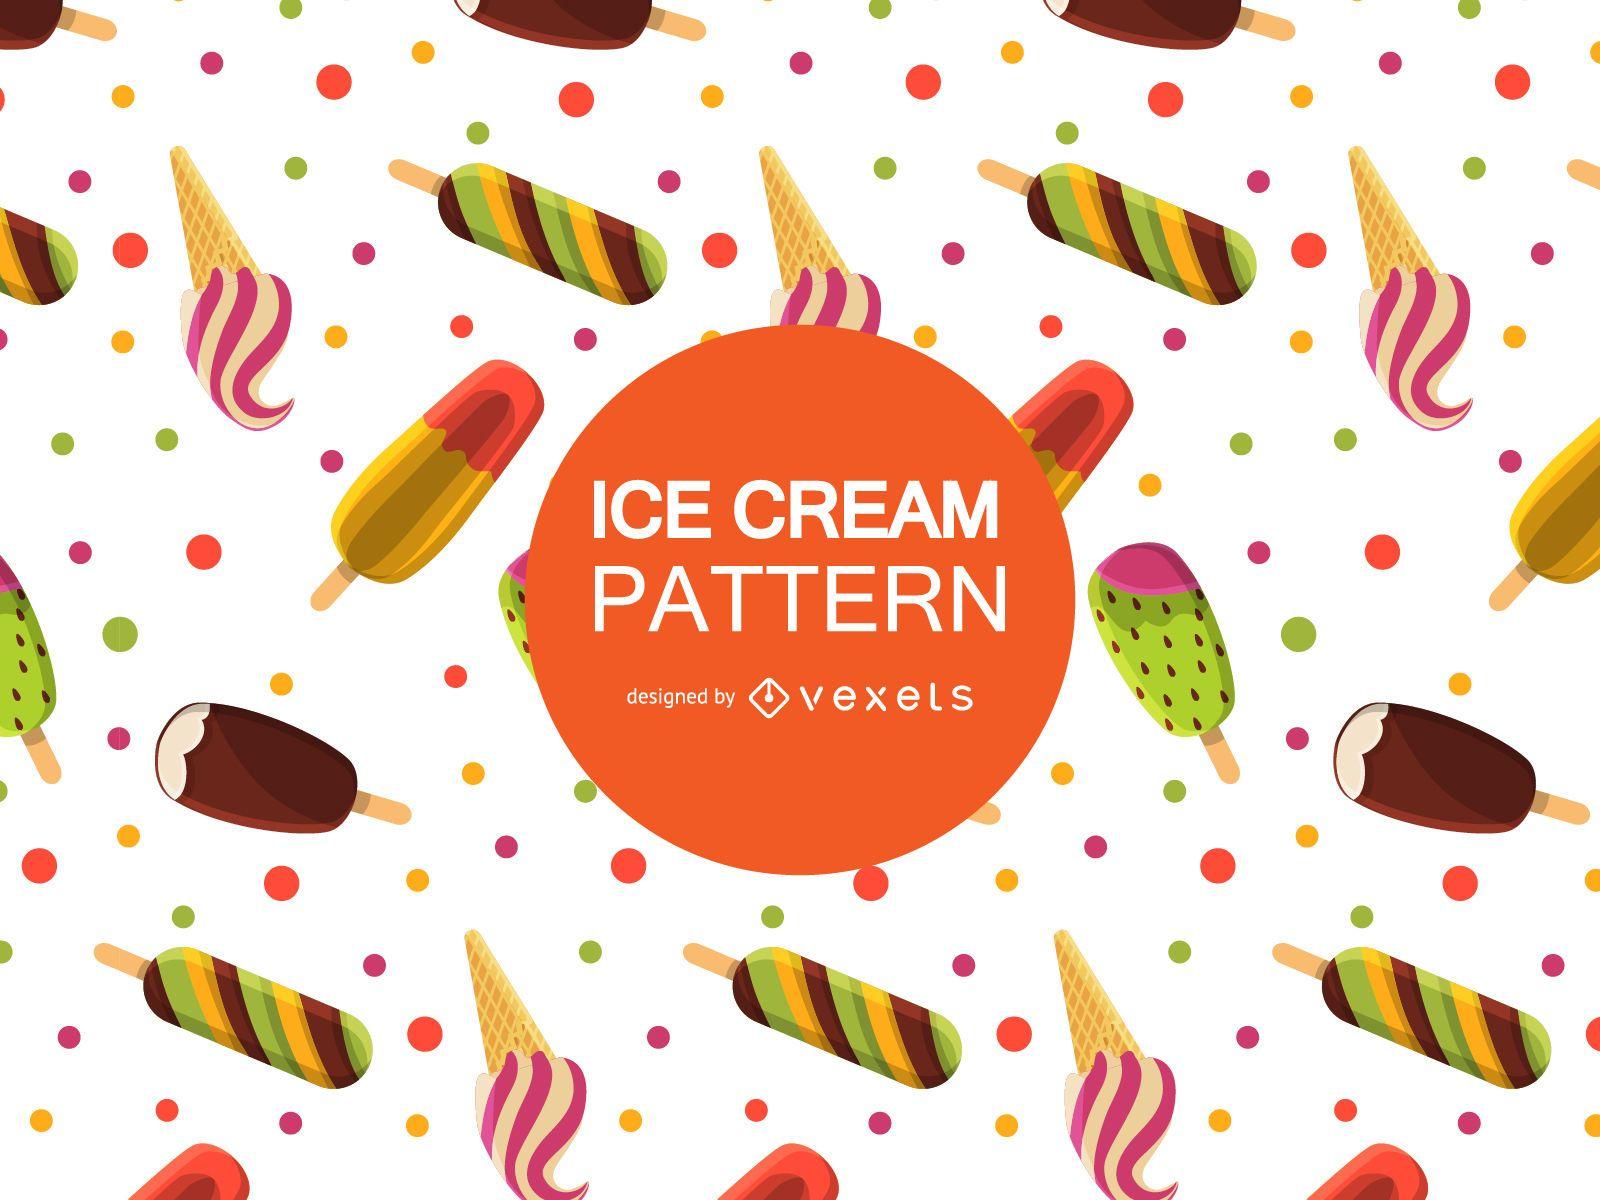 Cool ice cream pattern